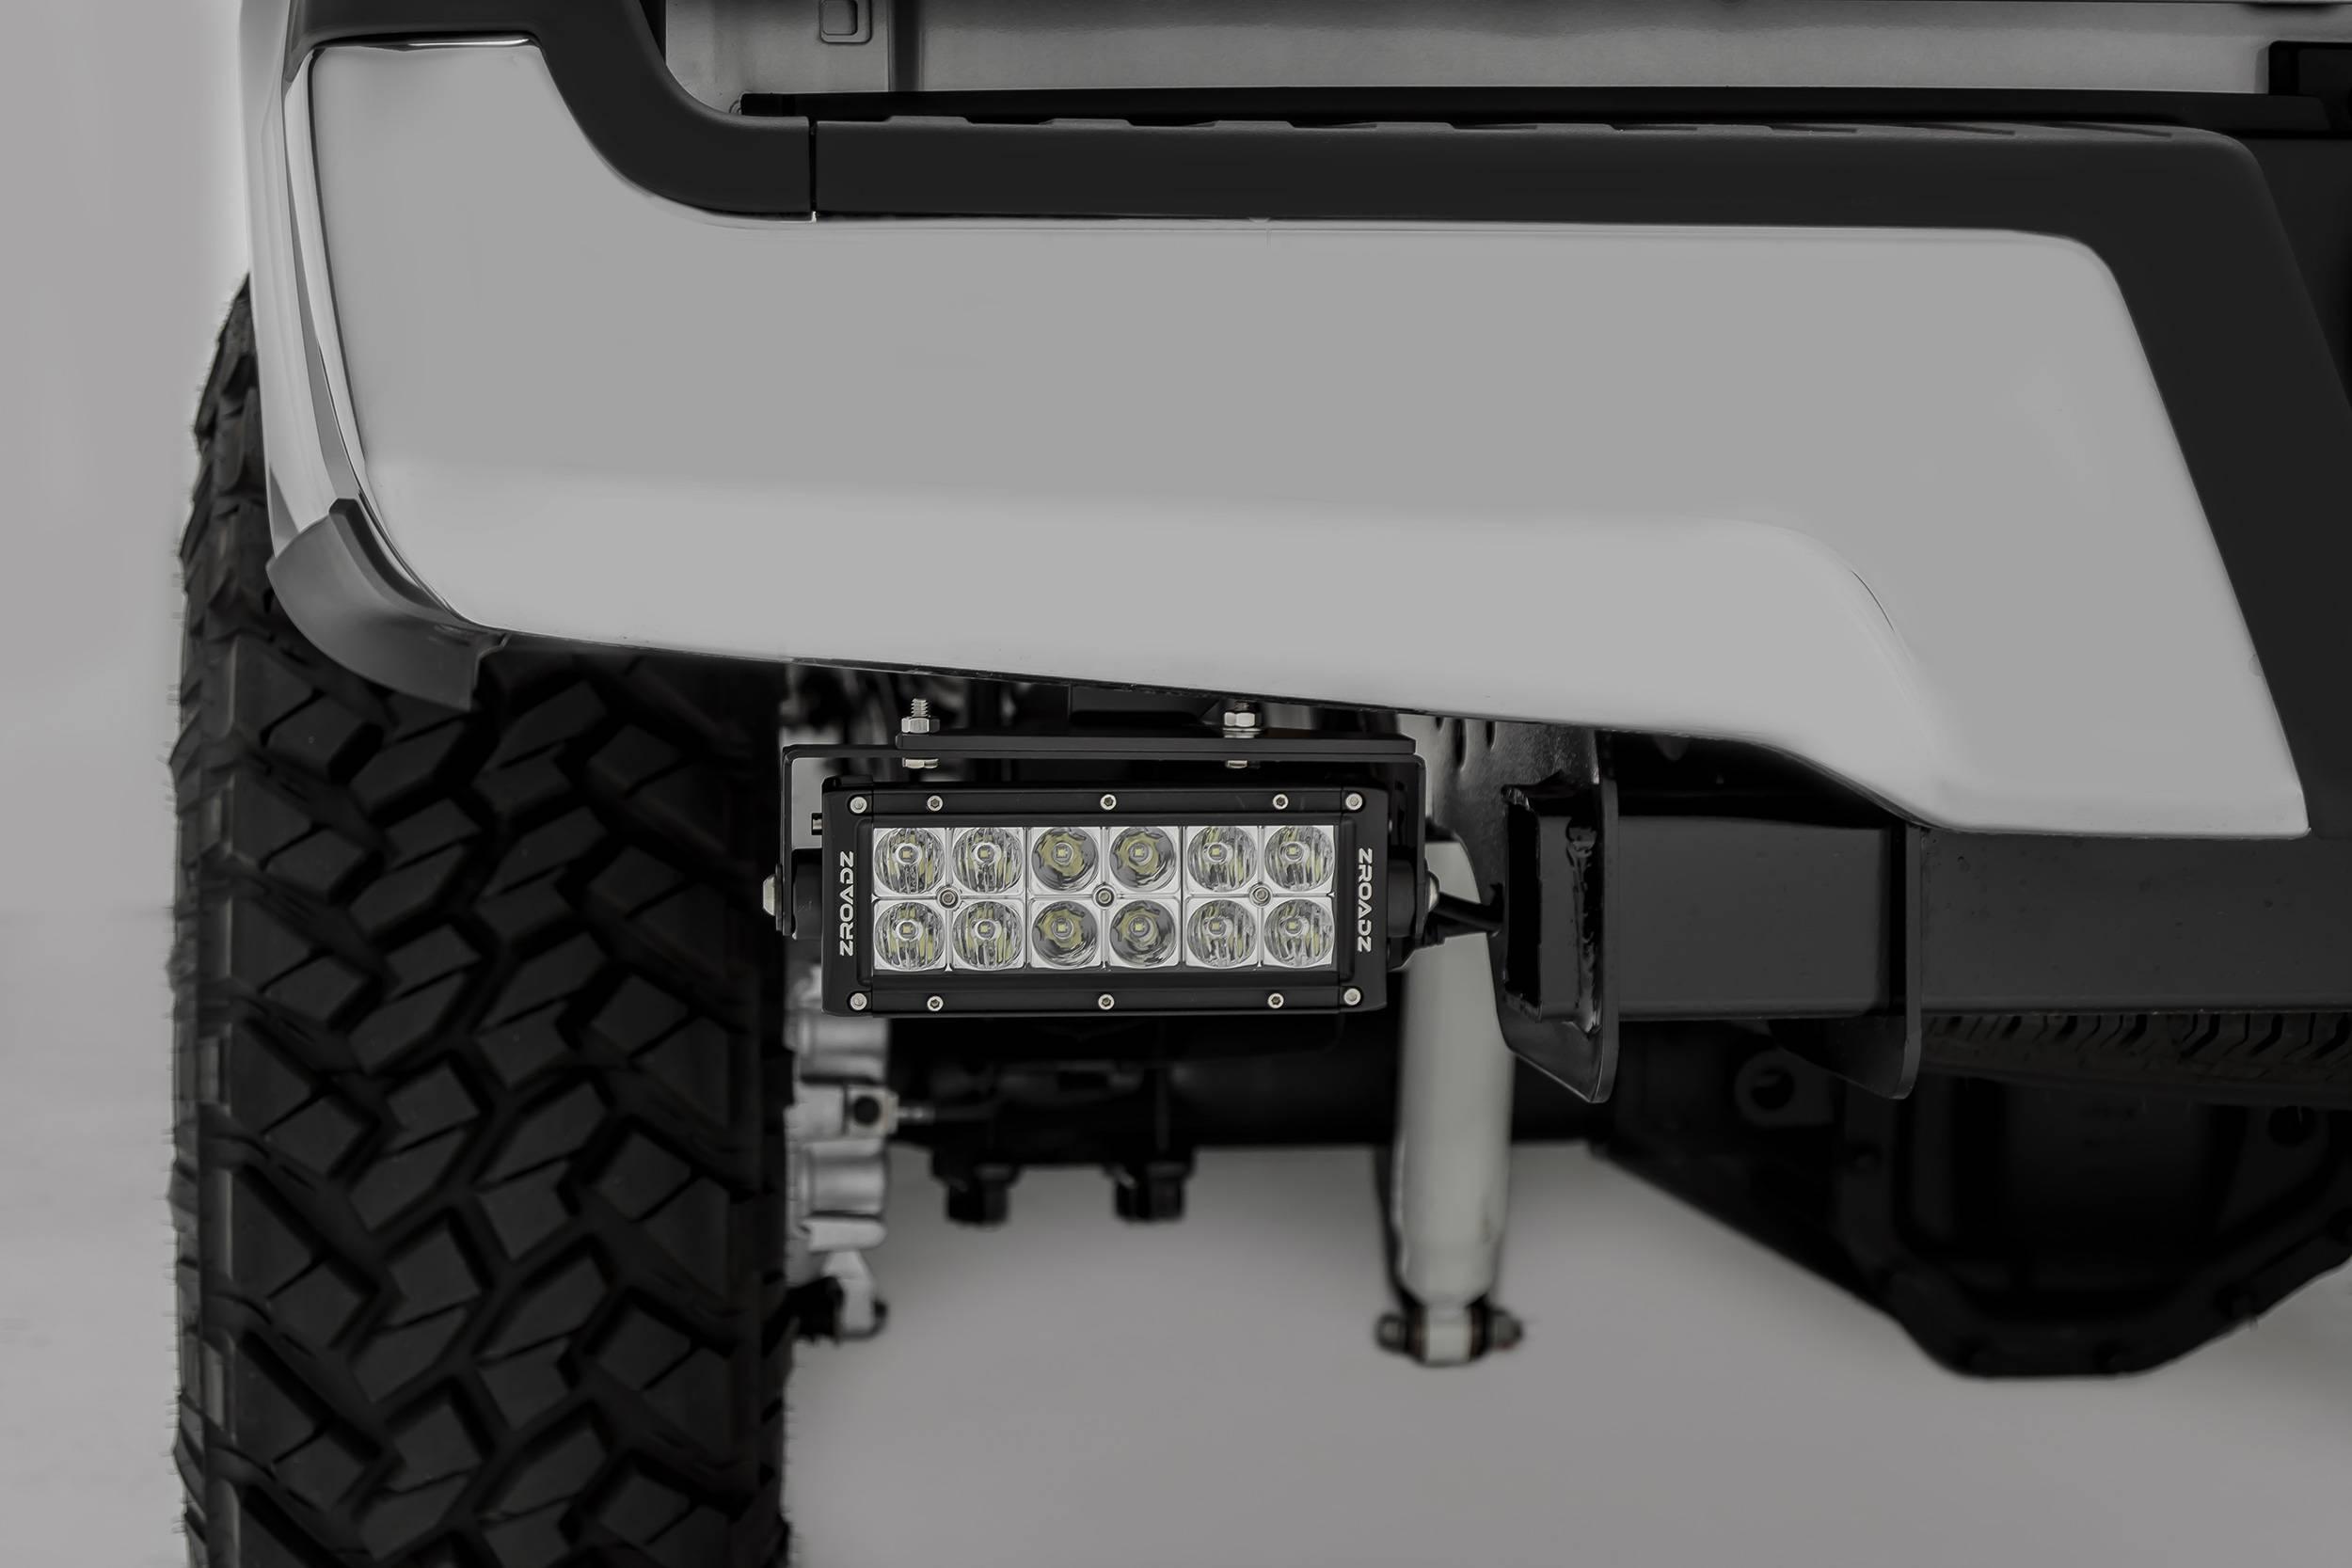 ZROADZ OFF ROAD PRODUCTS - 2017-2021 Ford Super Duty Rear Bumper LED Bracket to mount (2) 6 Inch Straight Light Bar - PN #Z385471